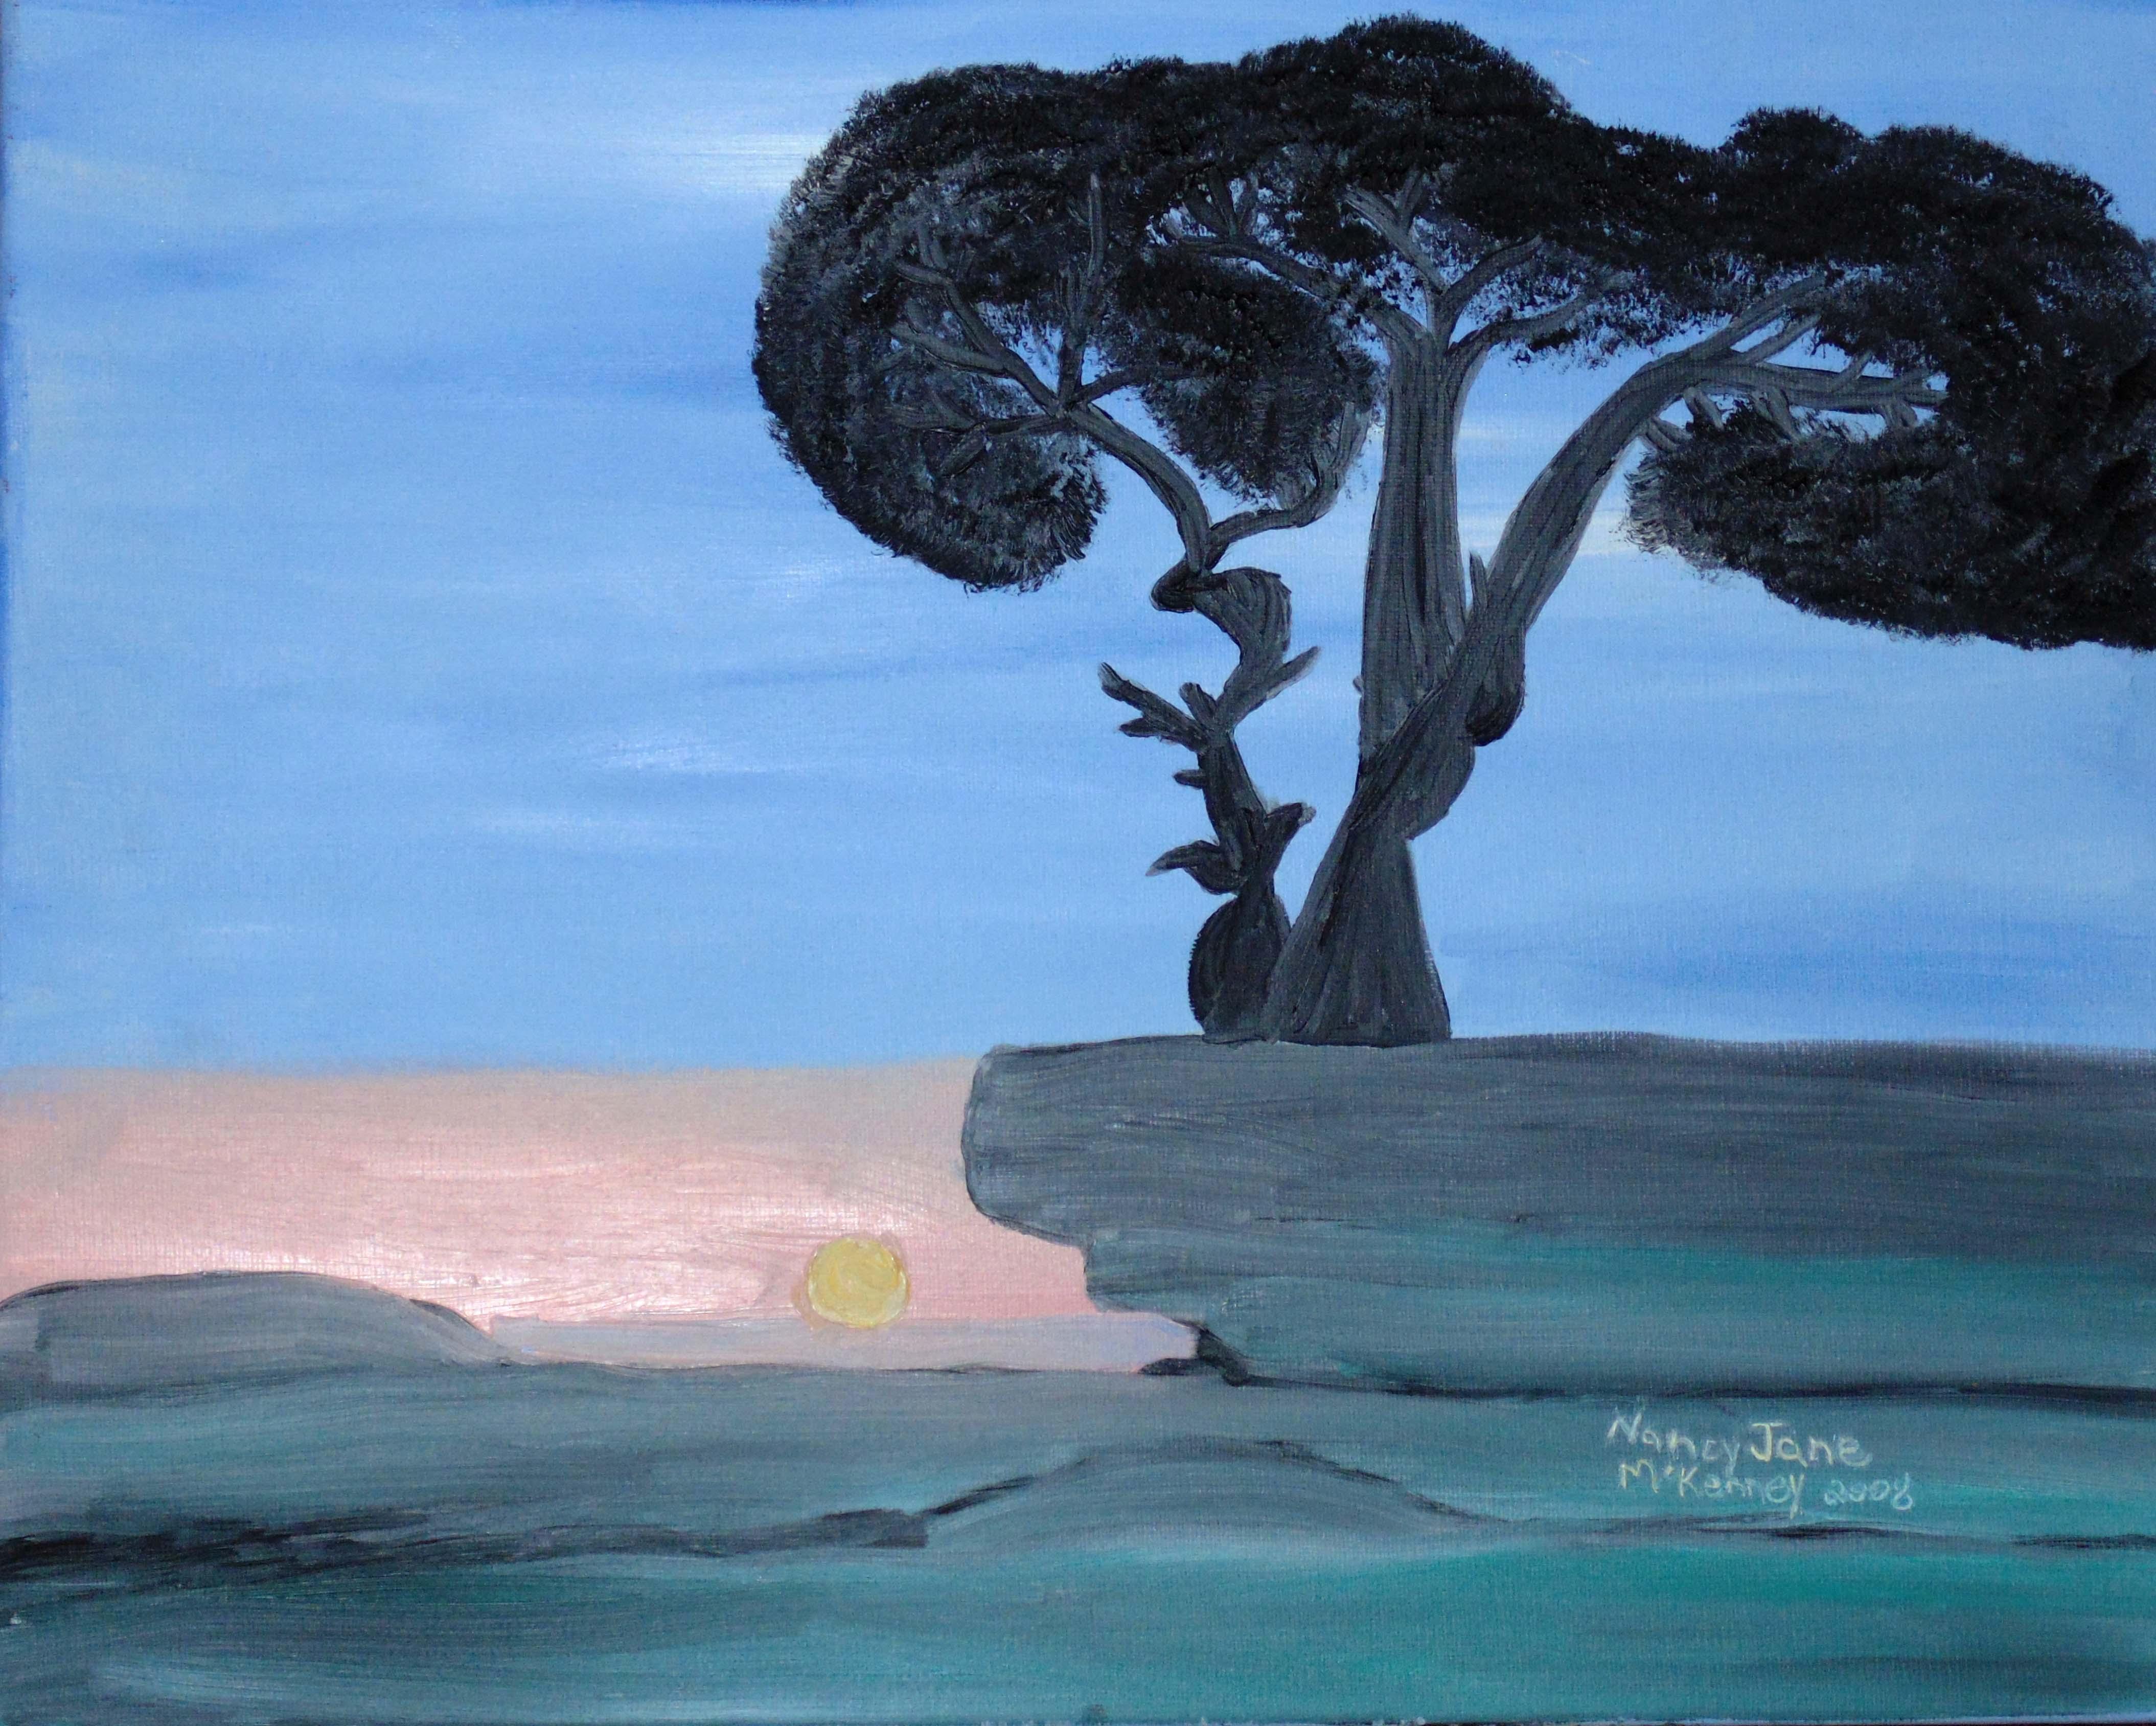 tree silouette